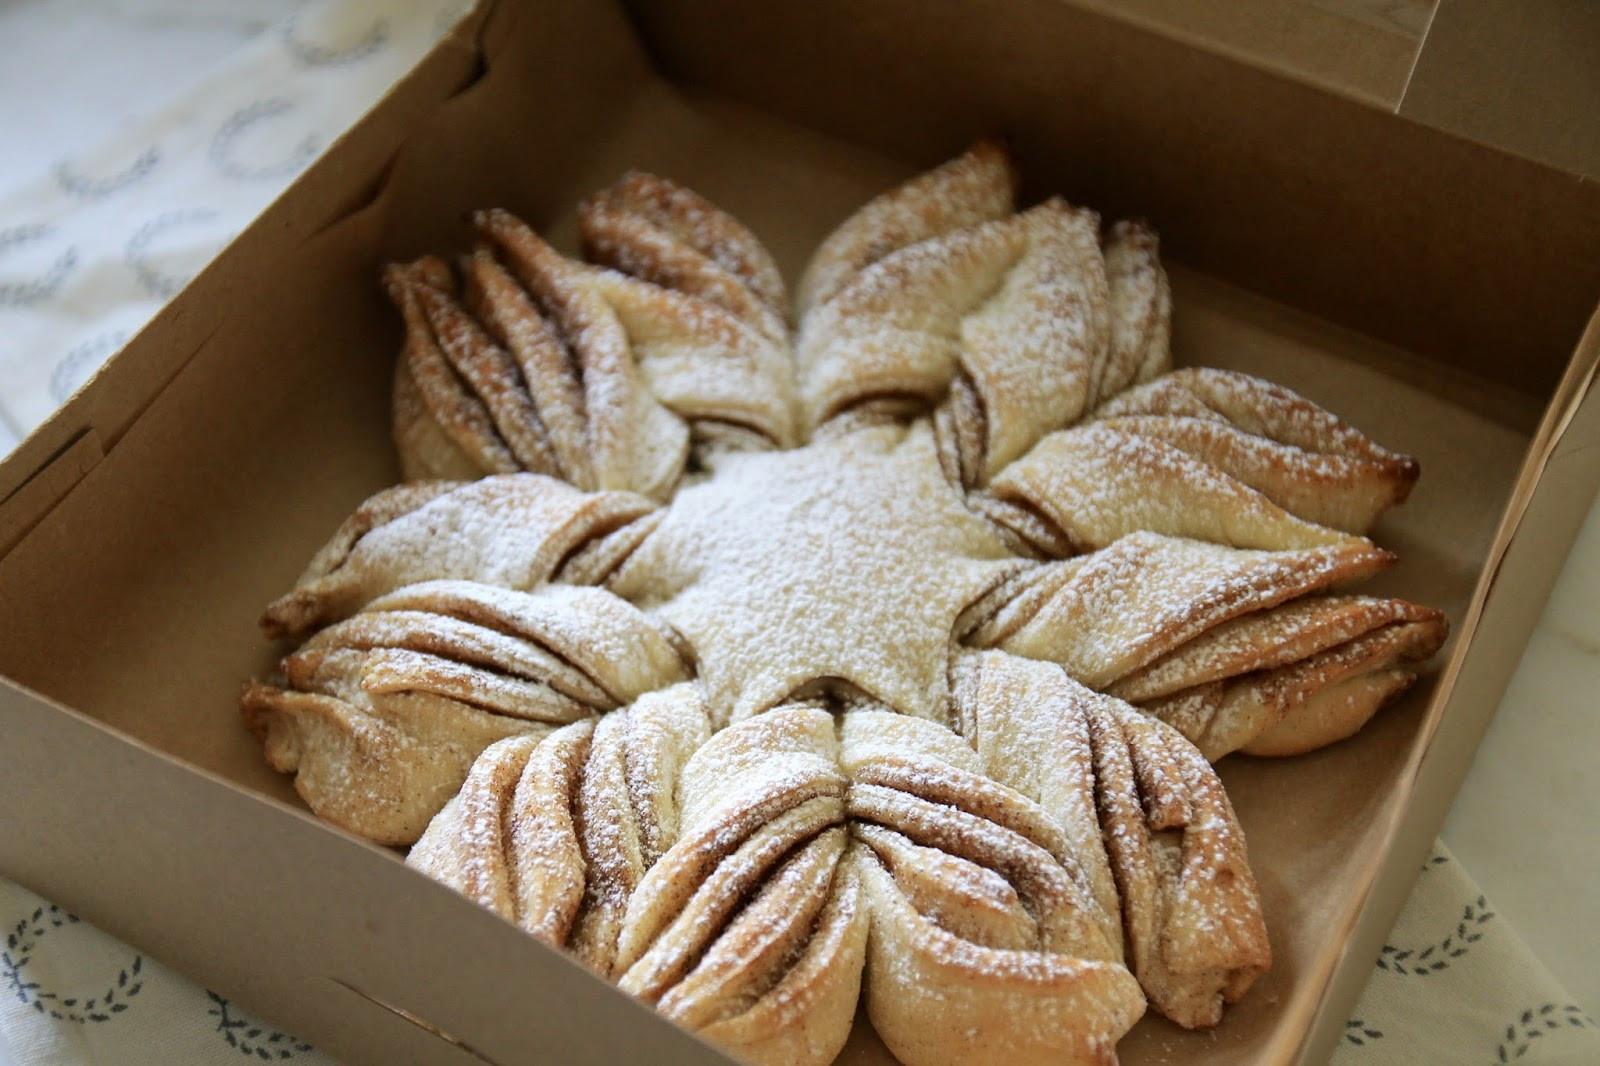 Christmas Baking Ideas  Jenny Steffens Hobick New Holiday Baking Ideas Christmas